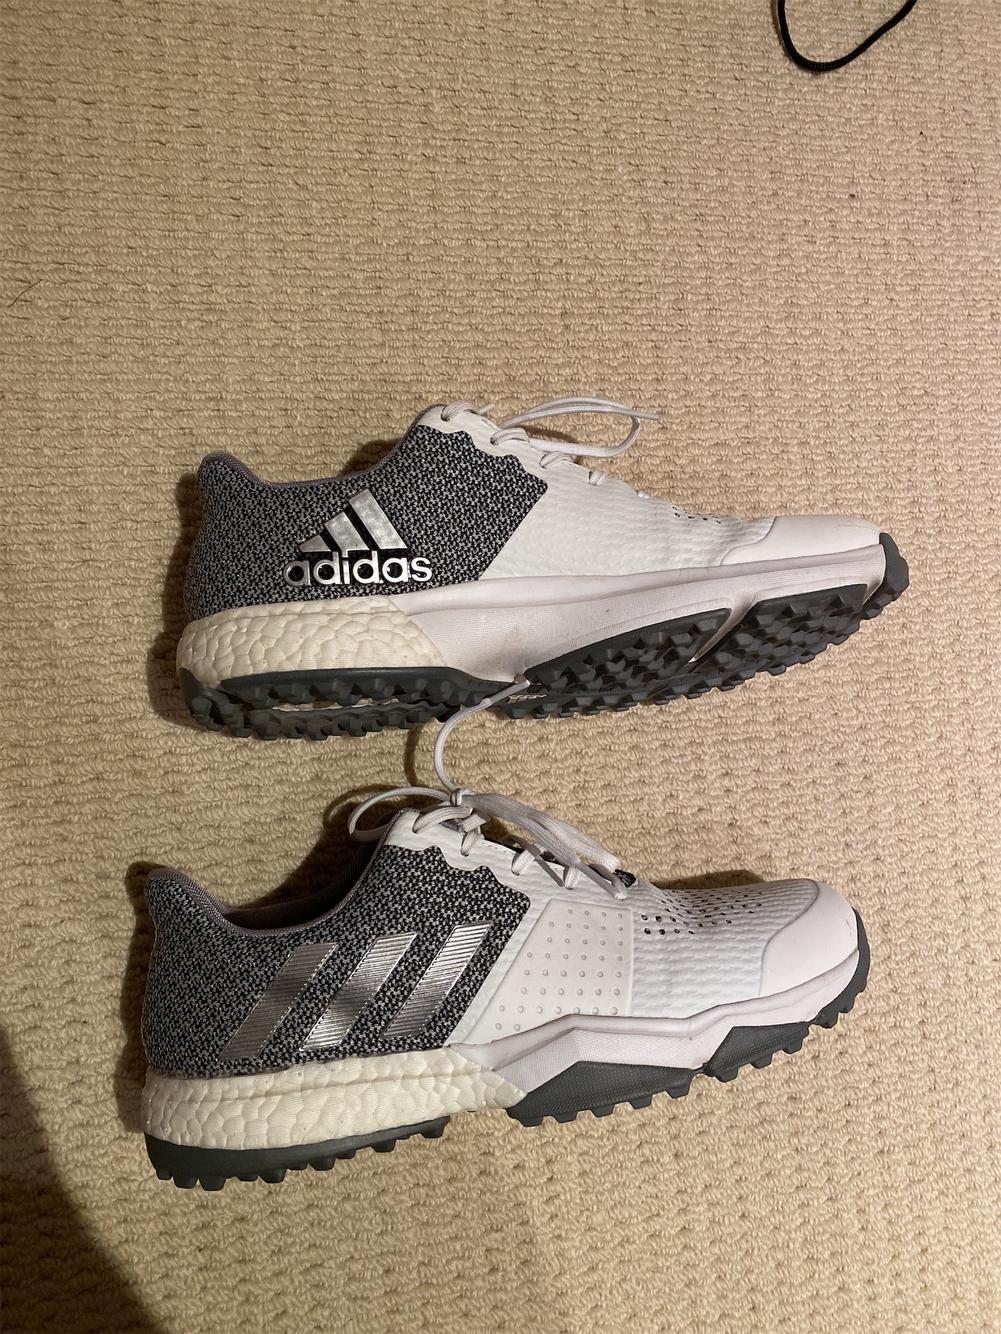 White Men's Size 9.0 (Women's 10) Adidas Golf Shoes | SidelineSwap